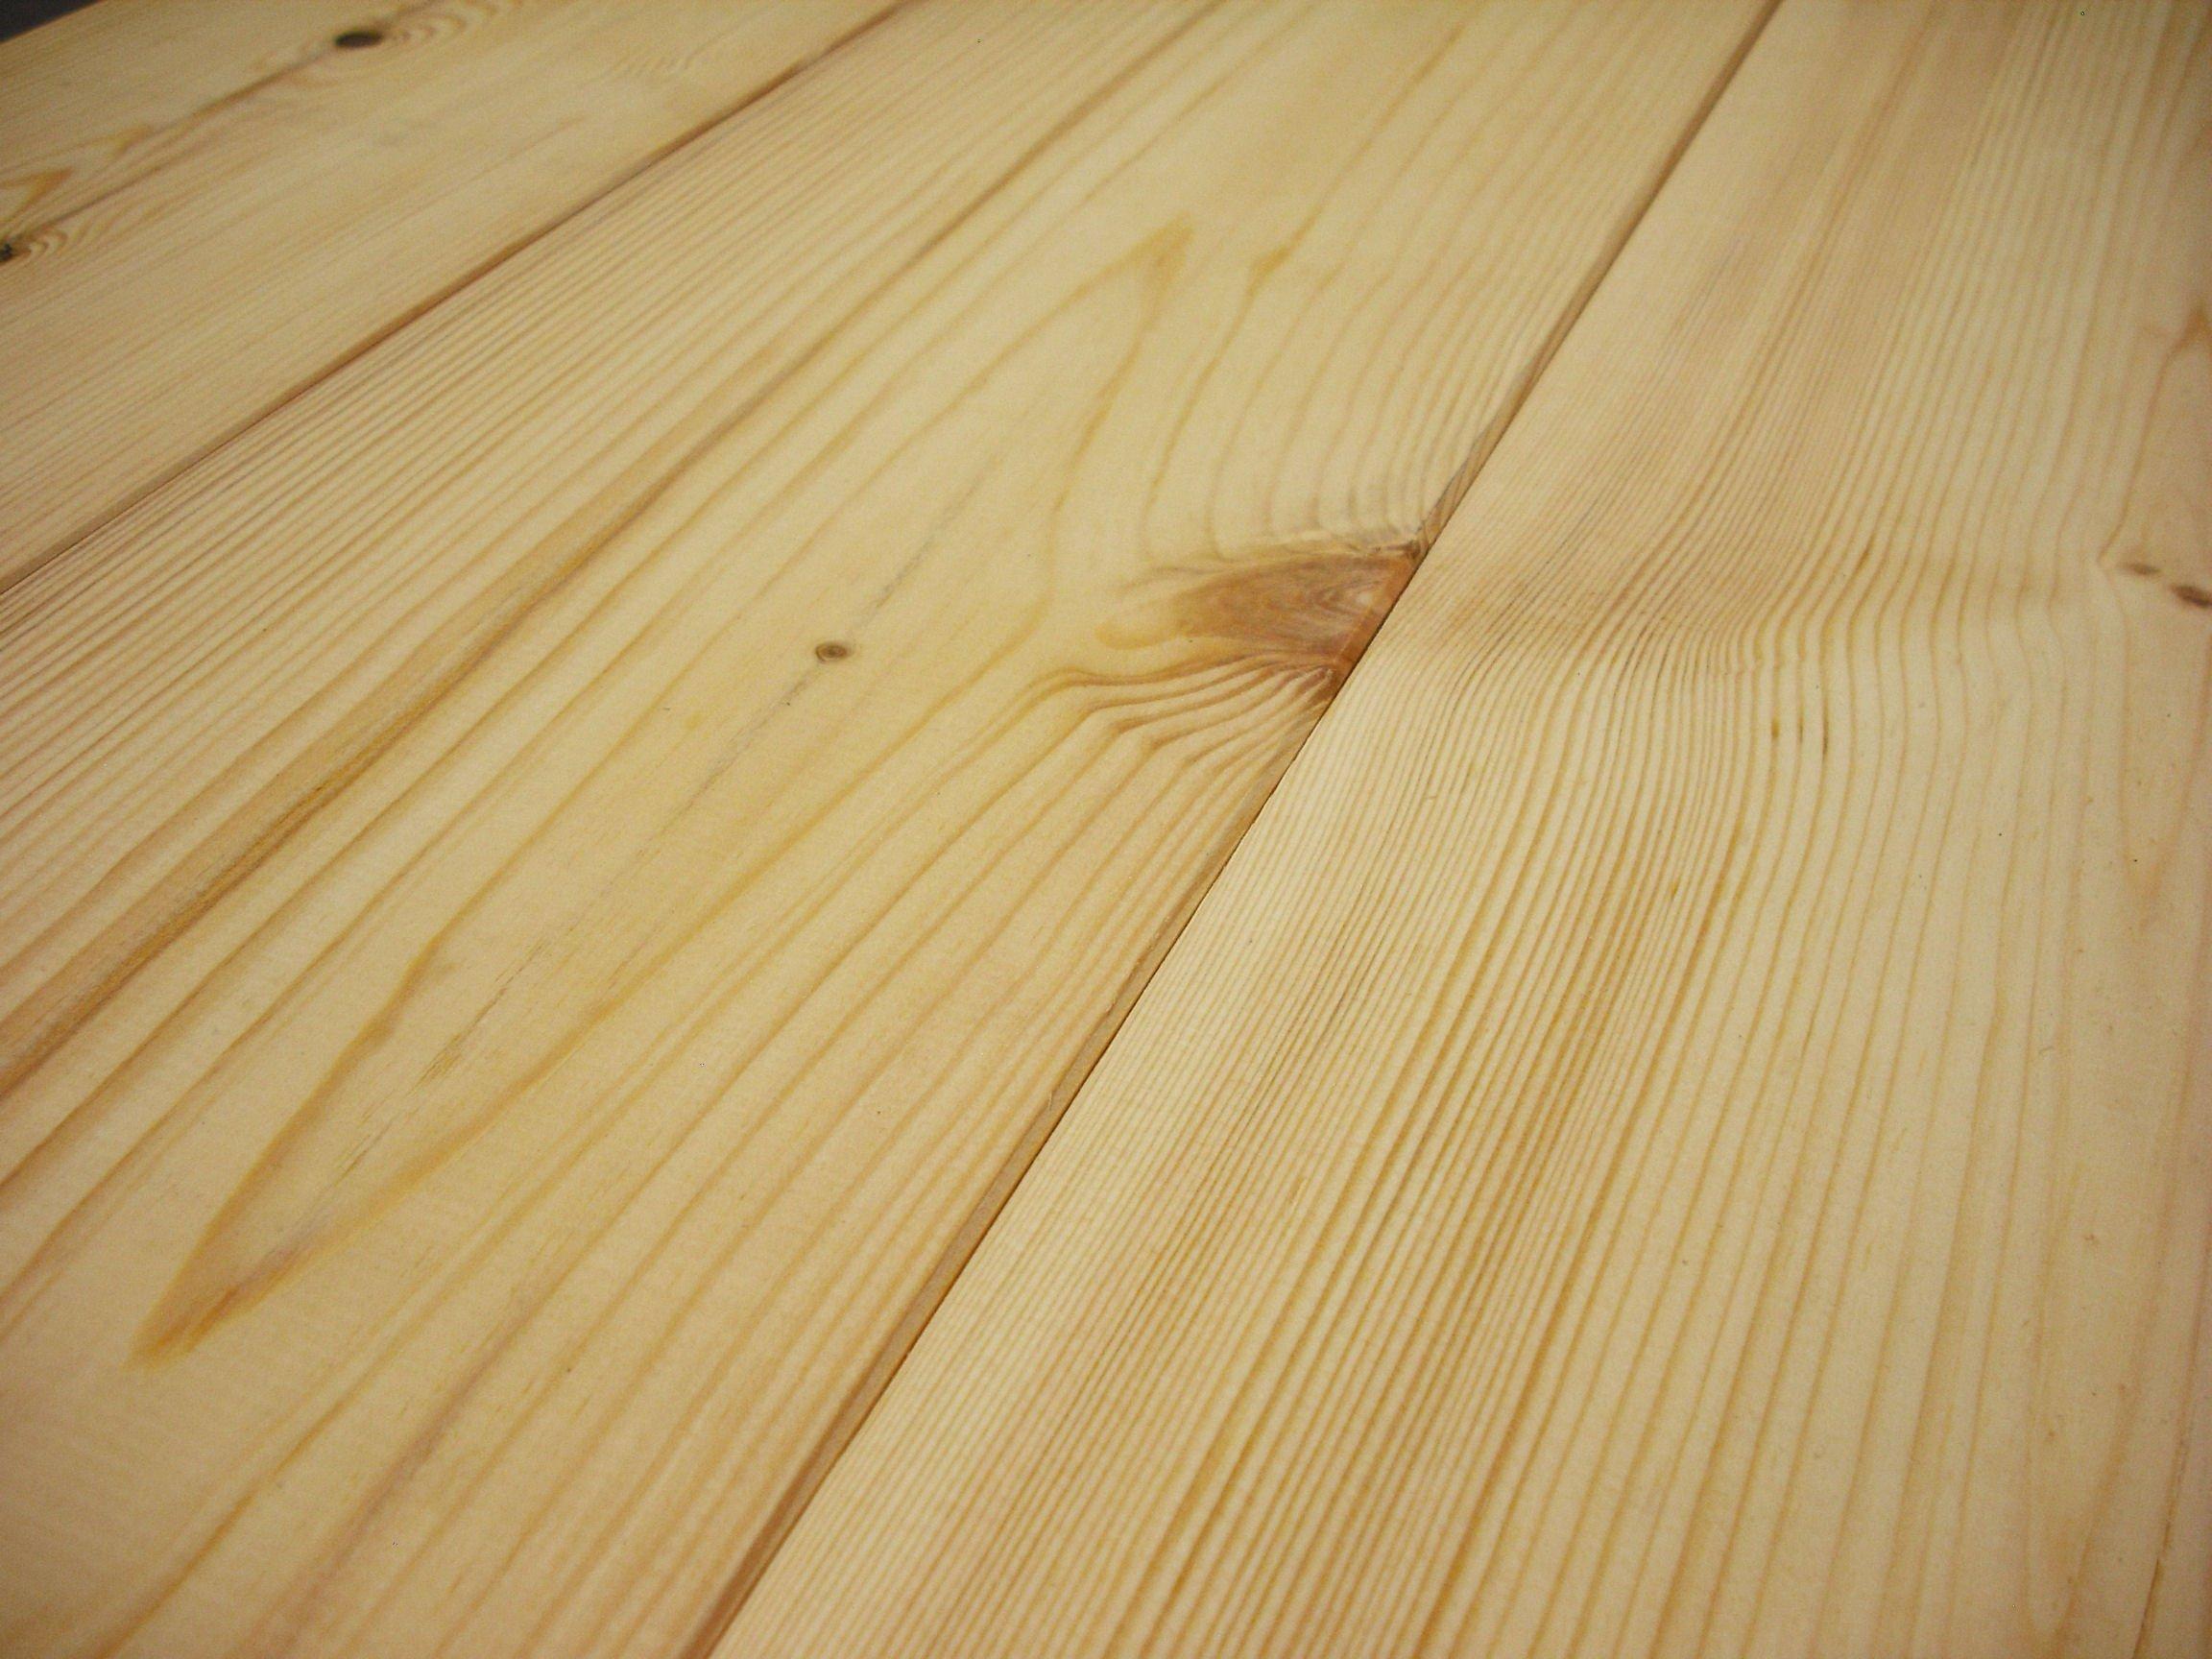 Massief Grenen Vloer : Massief grenen vloerdelen mm